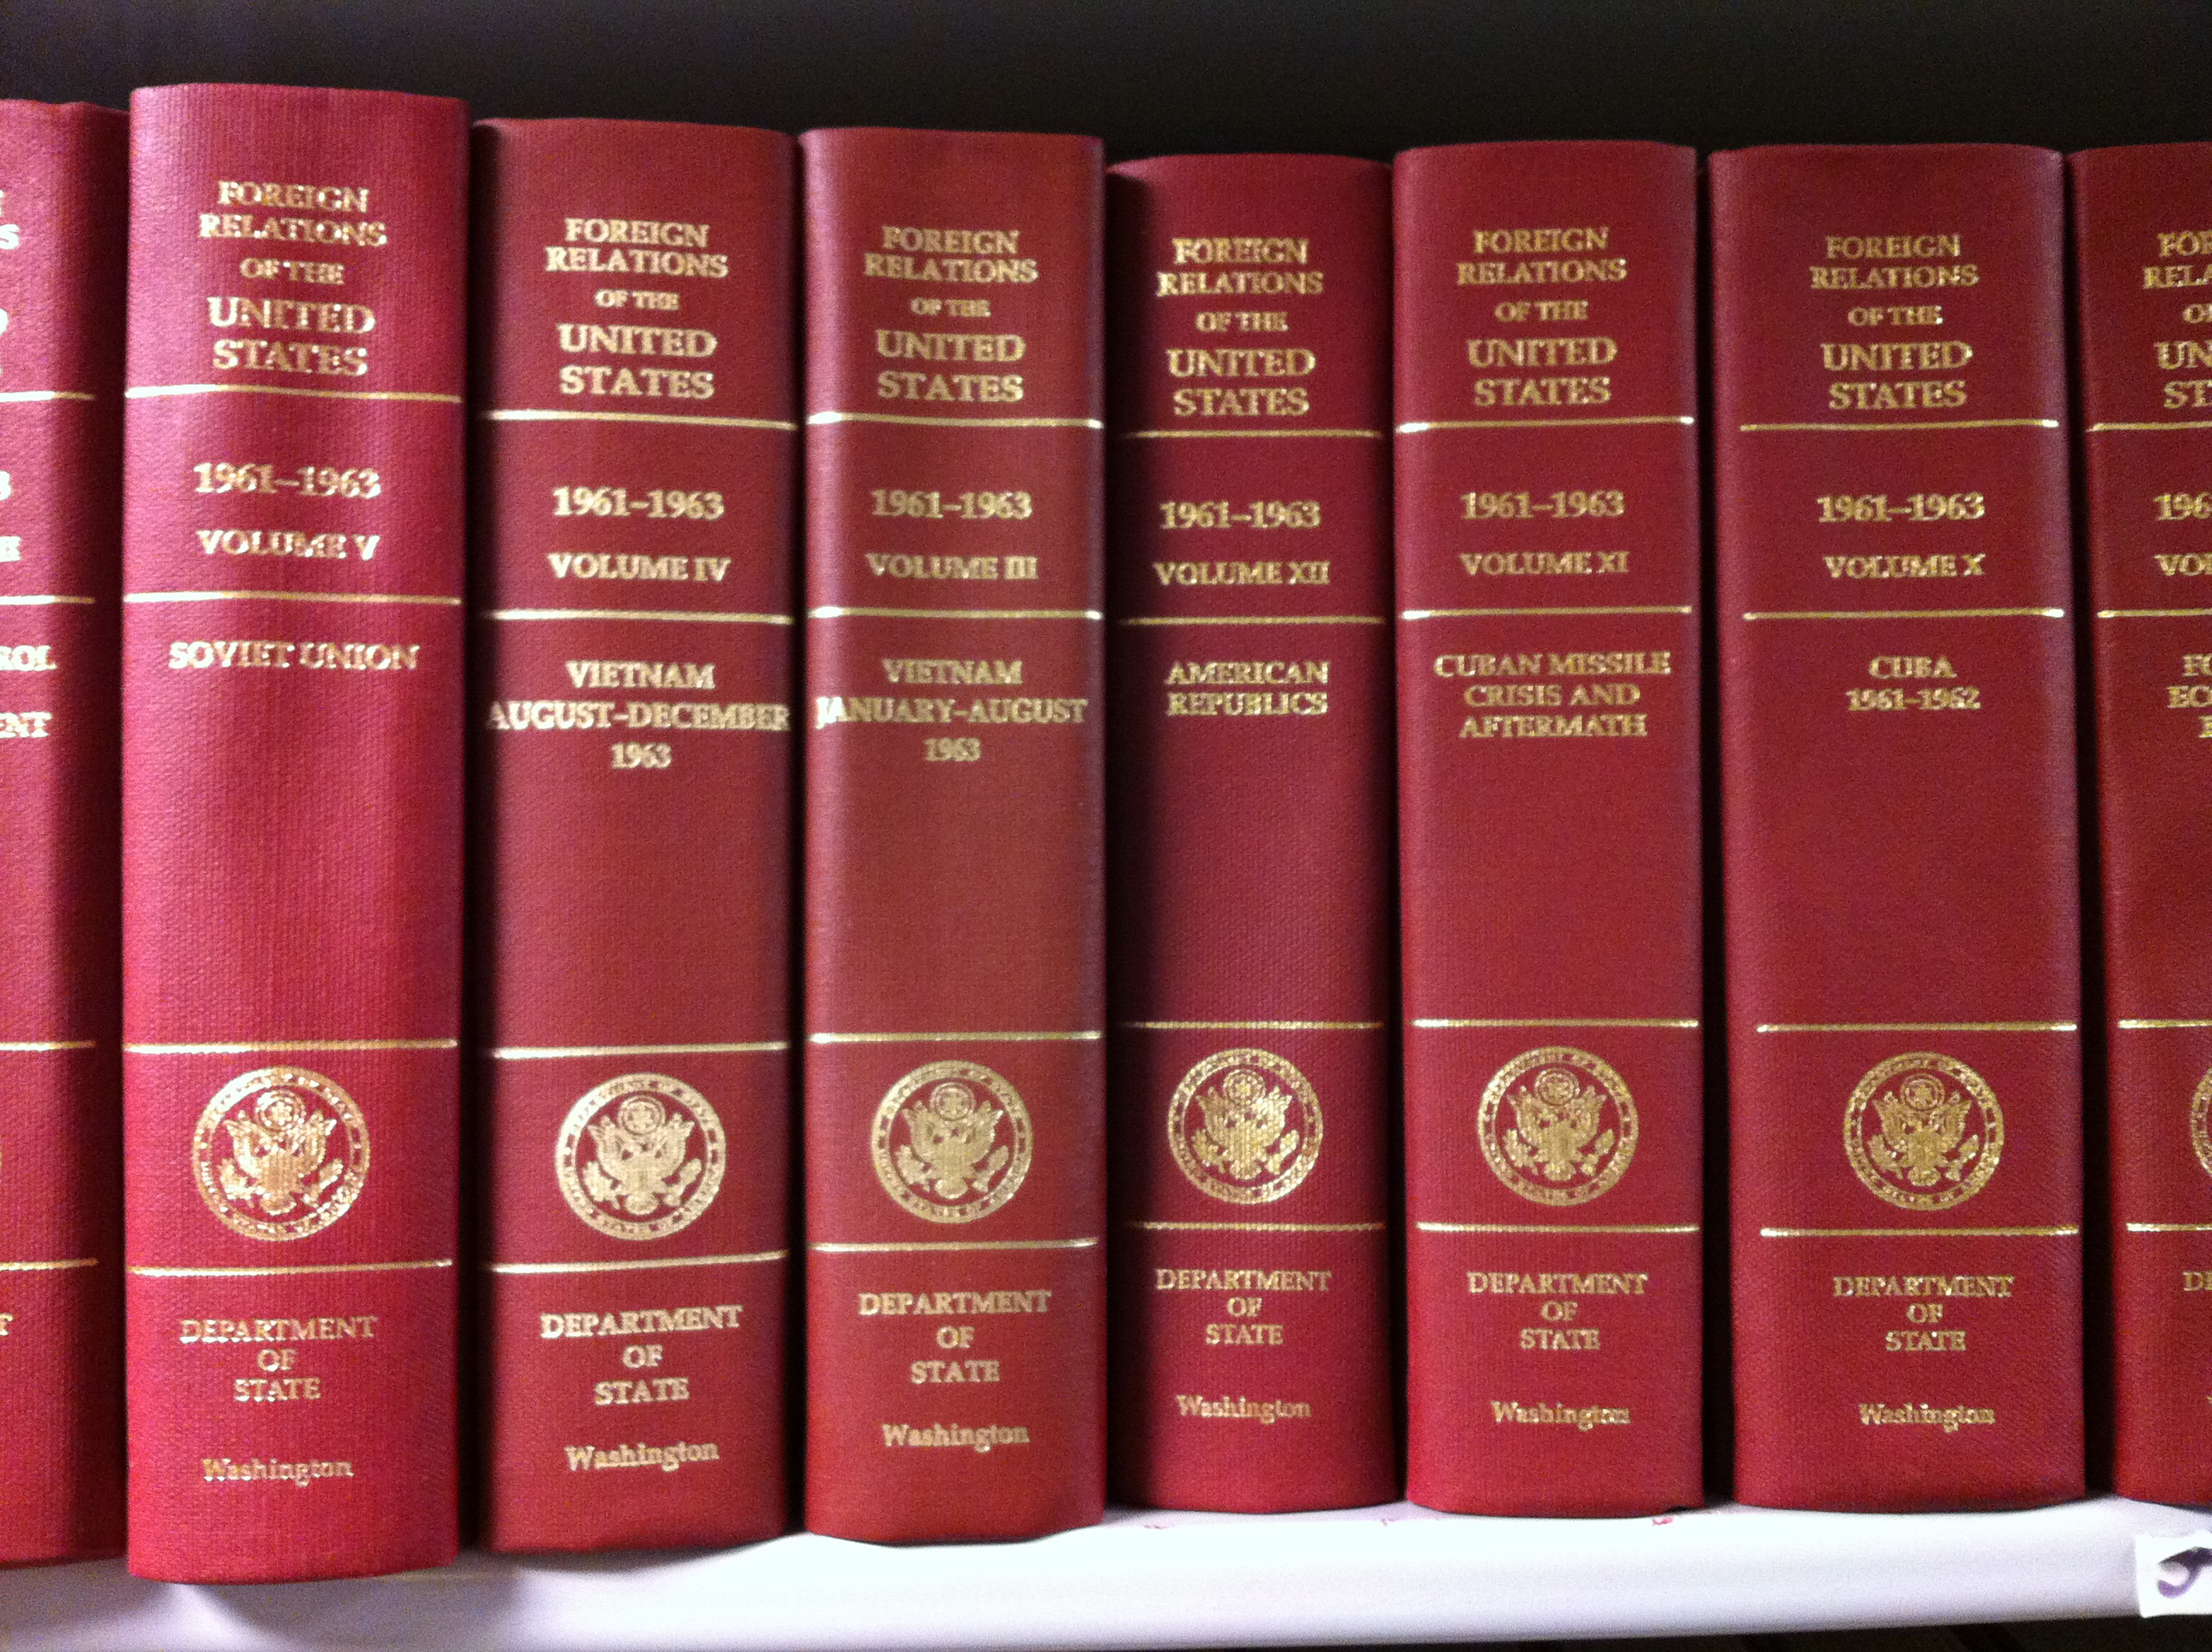 FRUS bookshelf